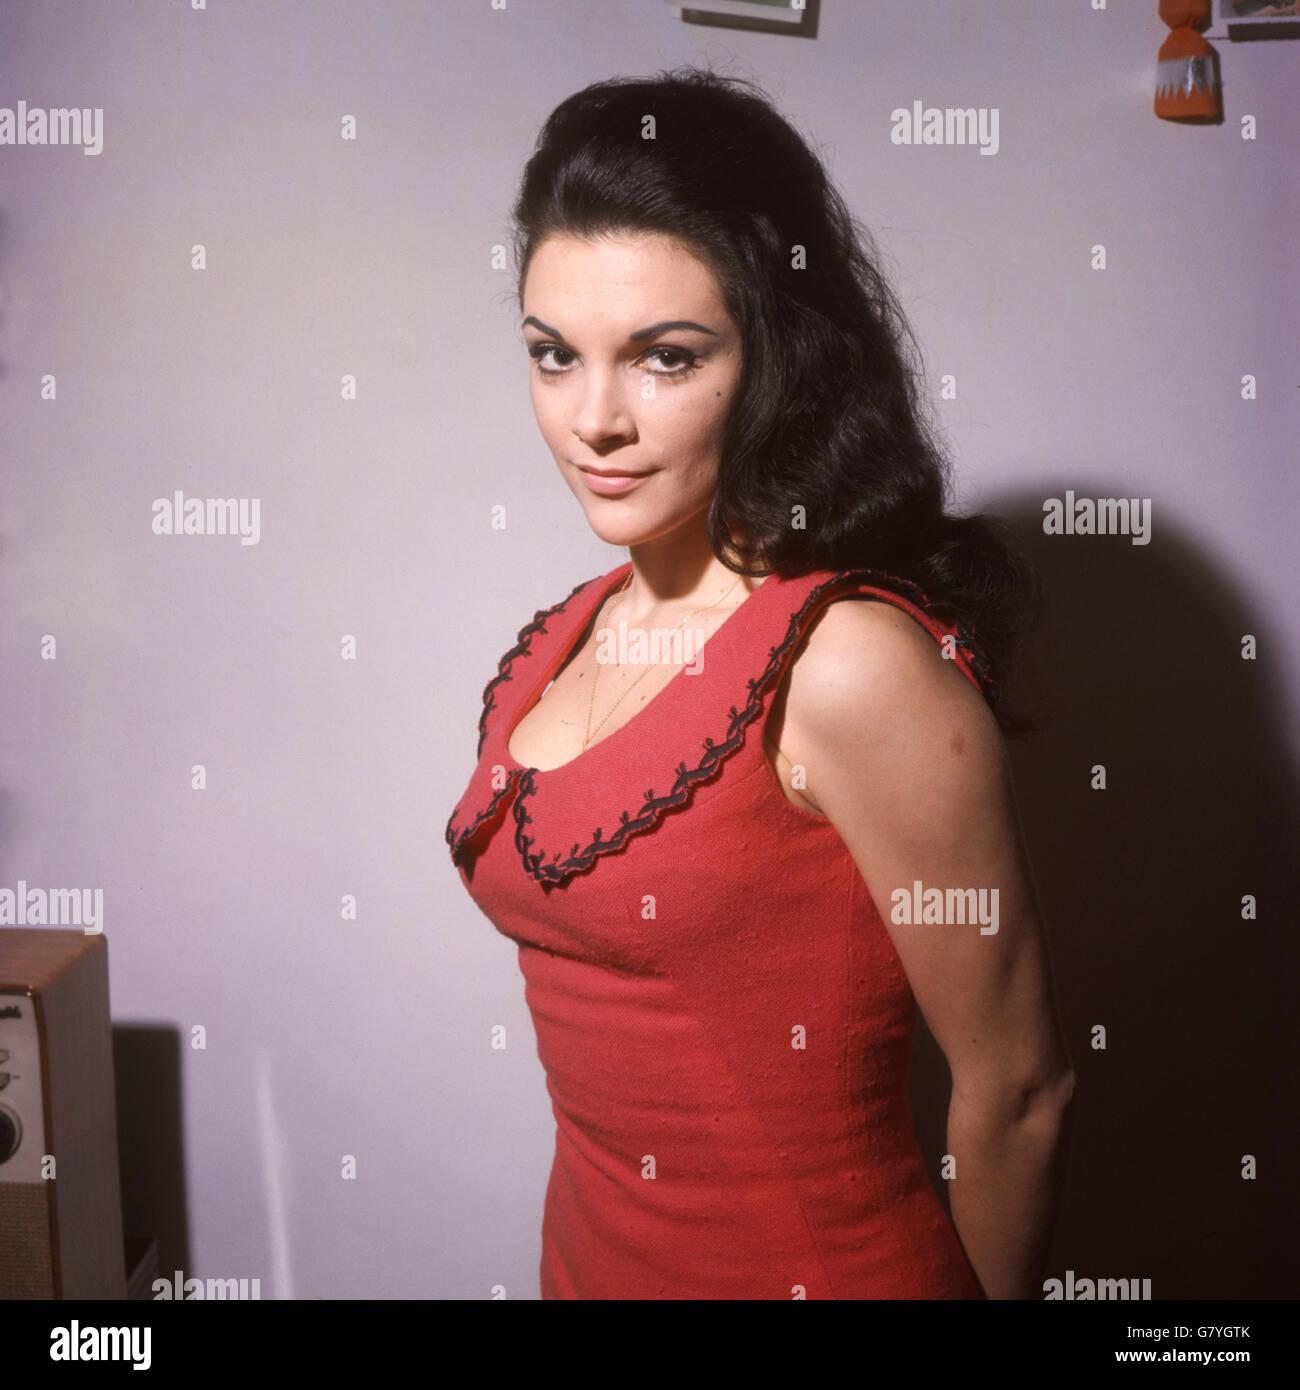 Watch Thelma Furness, Viscountess Furness video